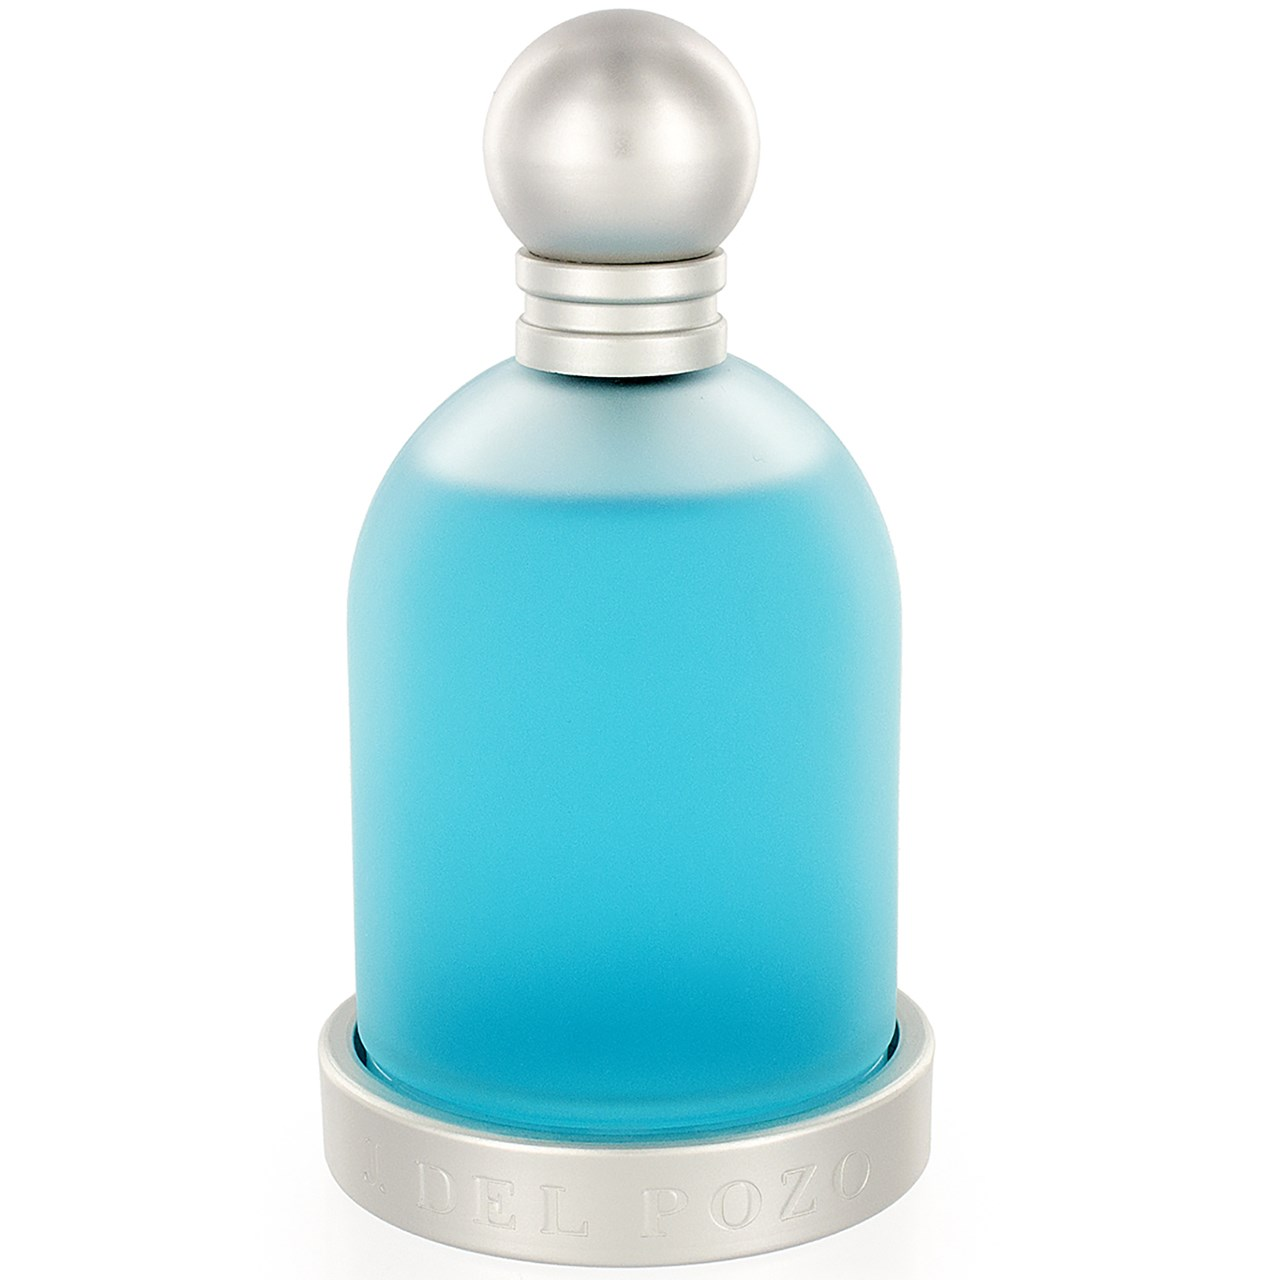 تستر ادو تویلت زنانه خسوس دل پوزو مدل Halloween Blue Drop حجم 100 میلی لیتر